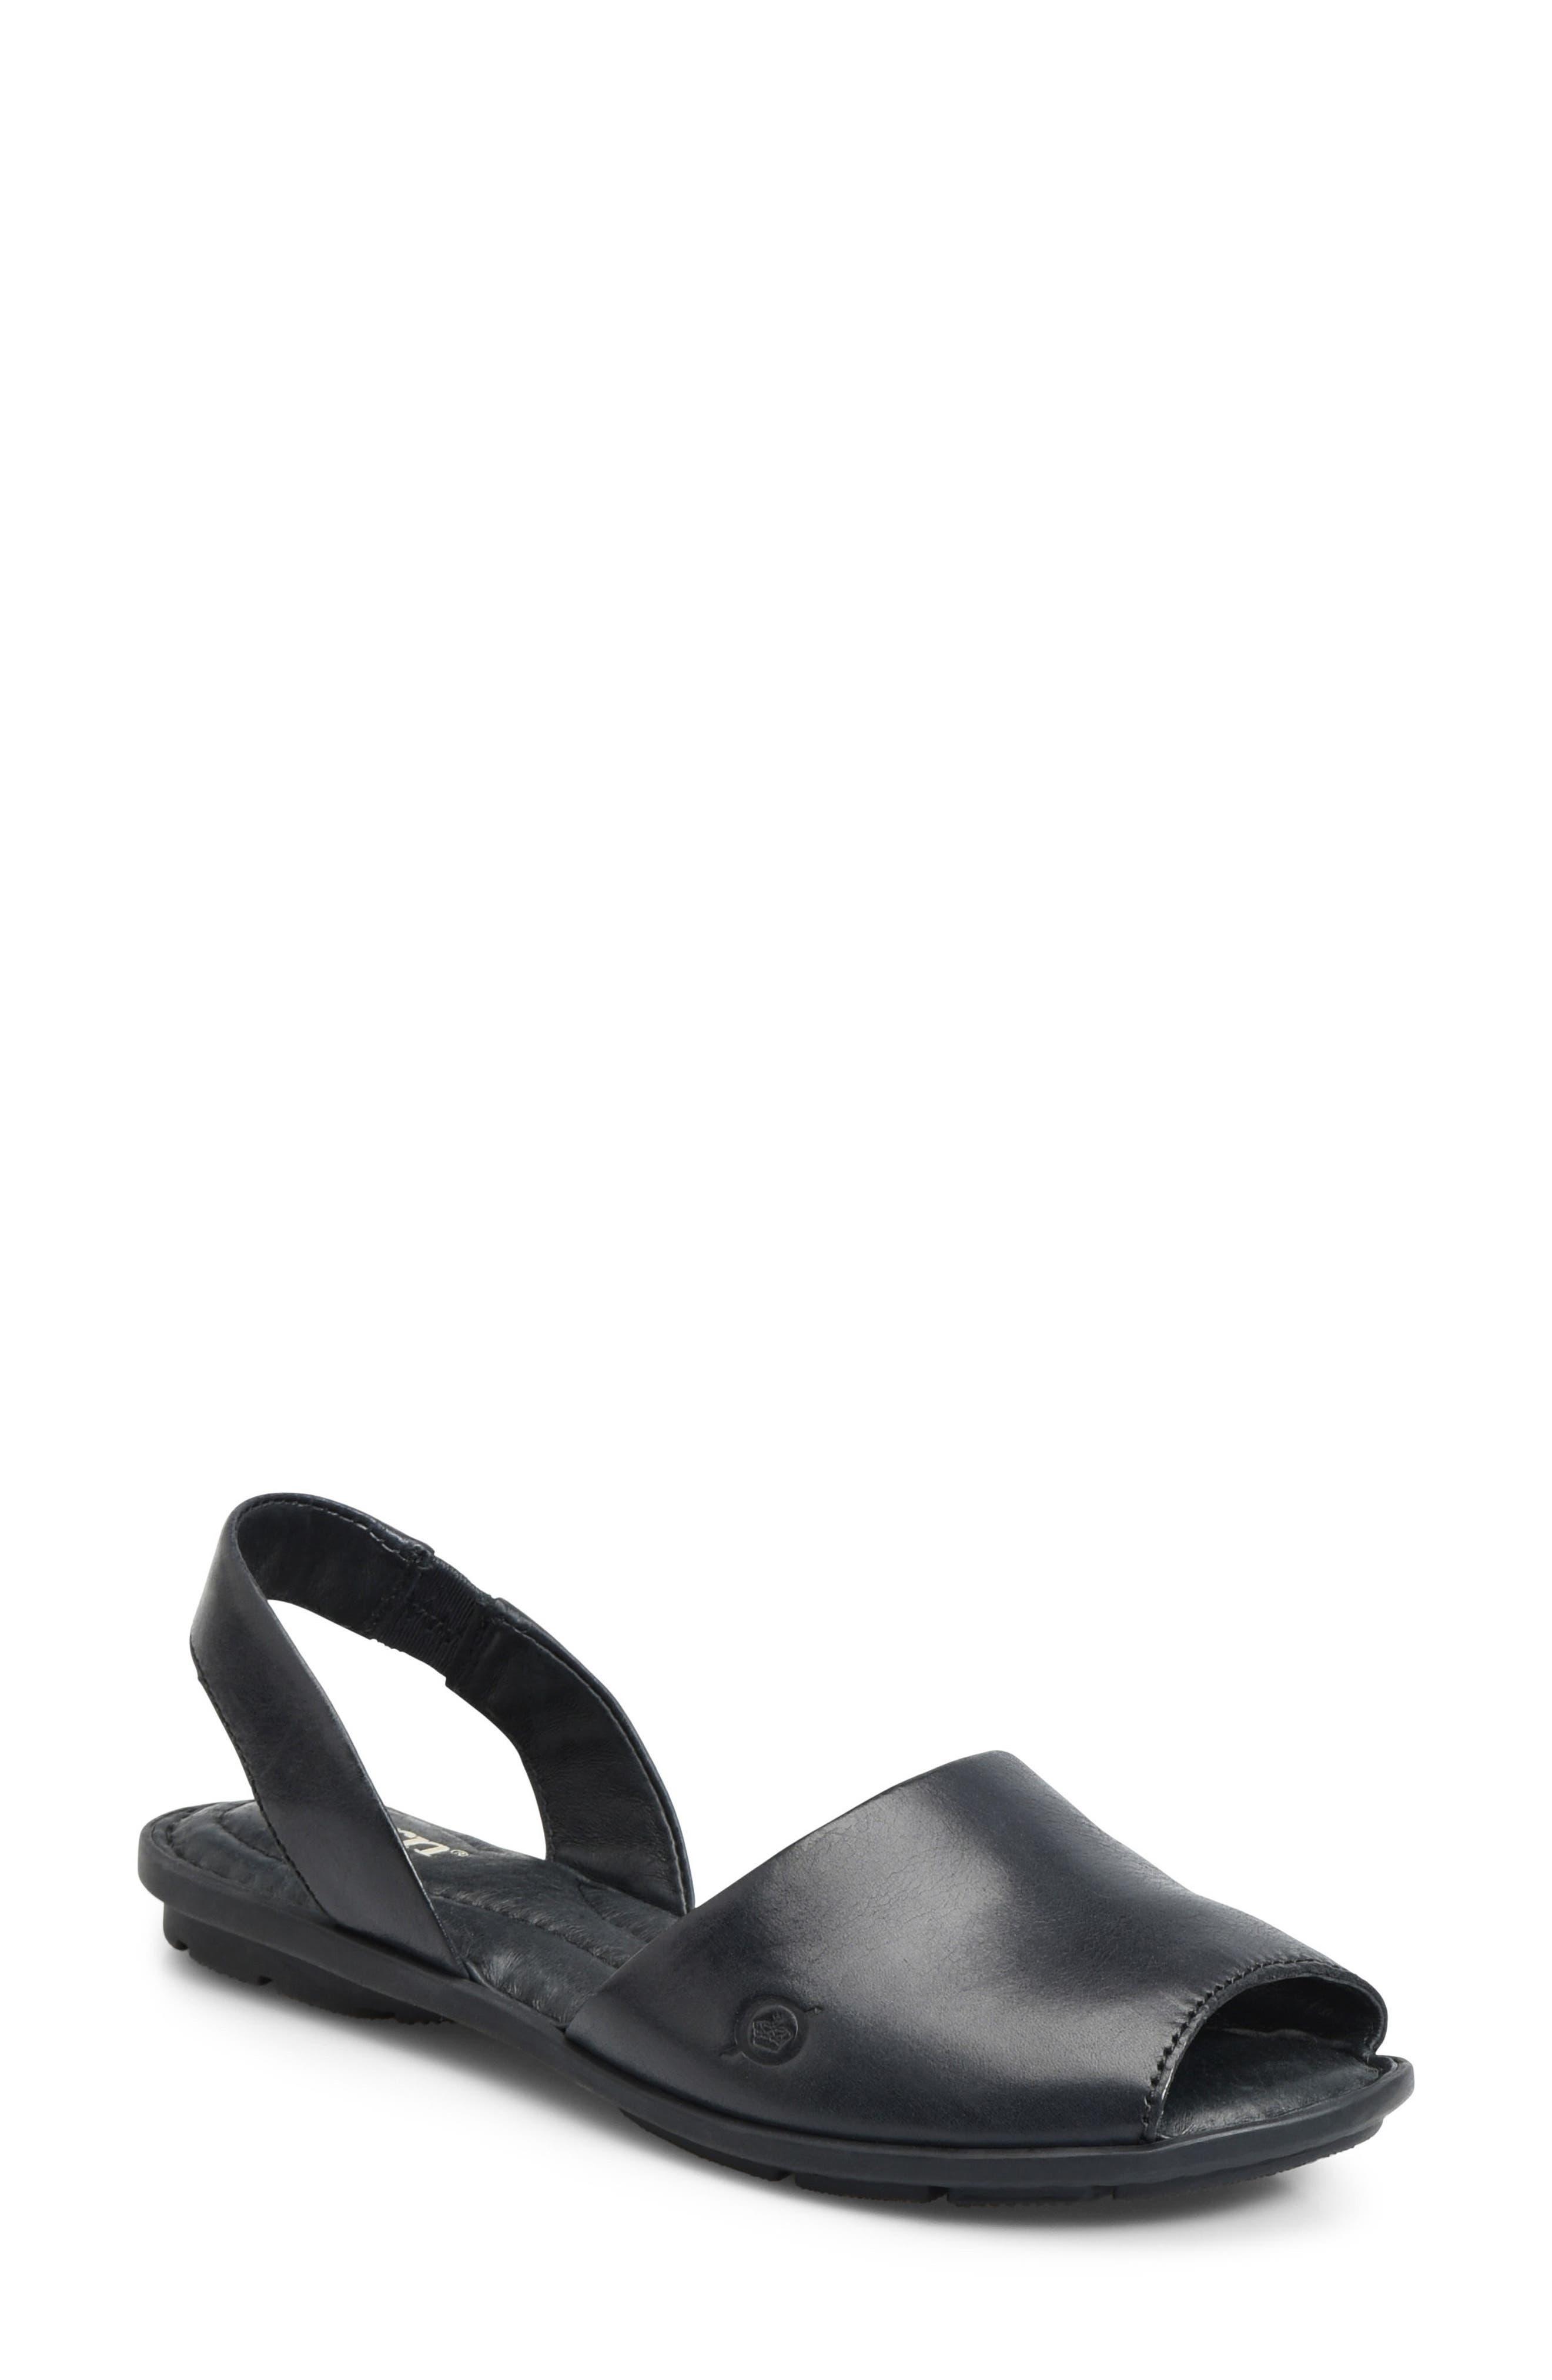 1cb9c473f71a born sandals